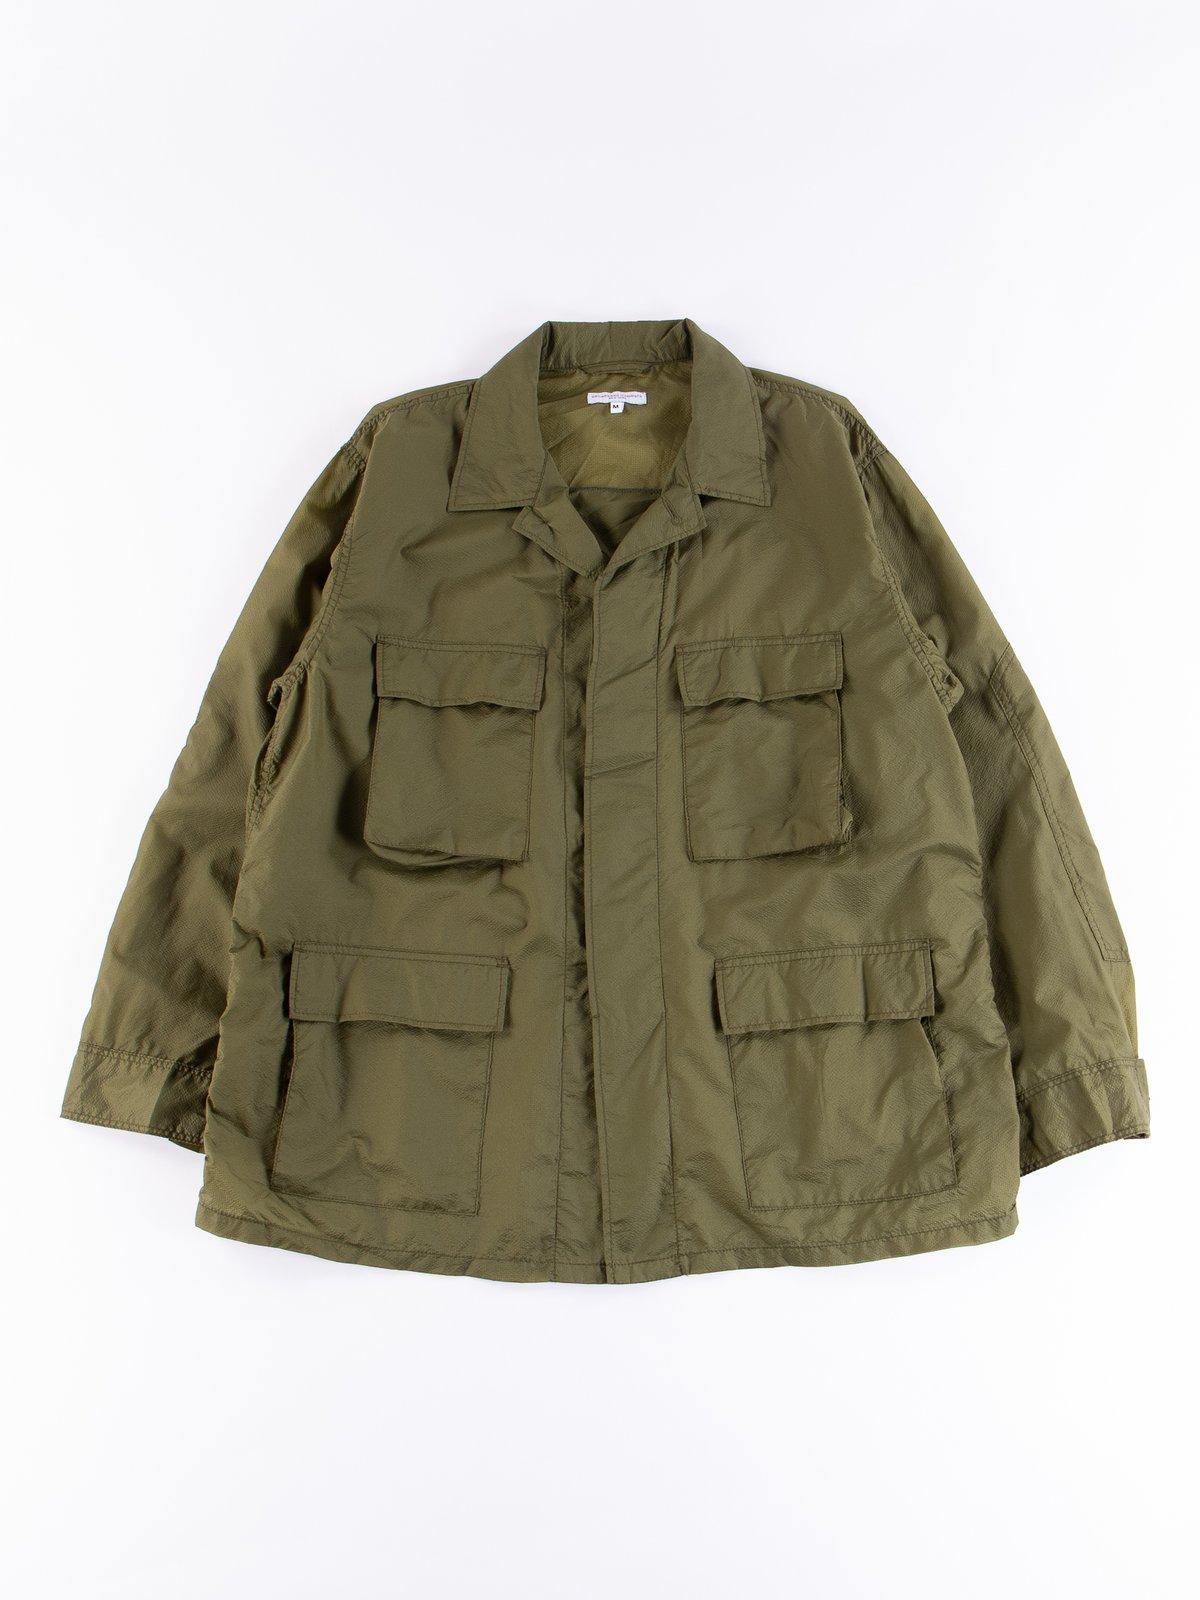 Olive Nylon Micro Ripstop BDU Jacket - Image 1